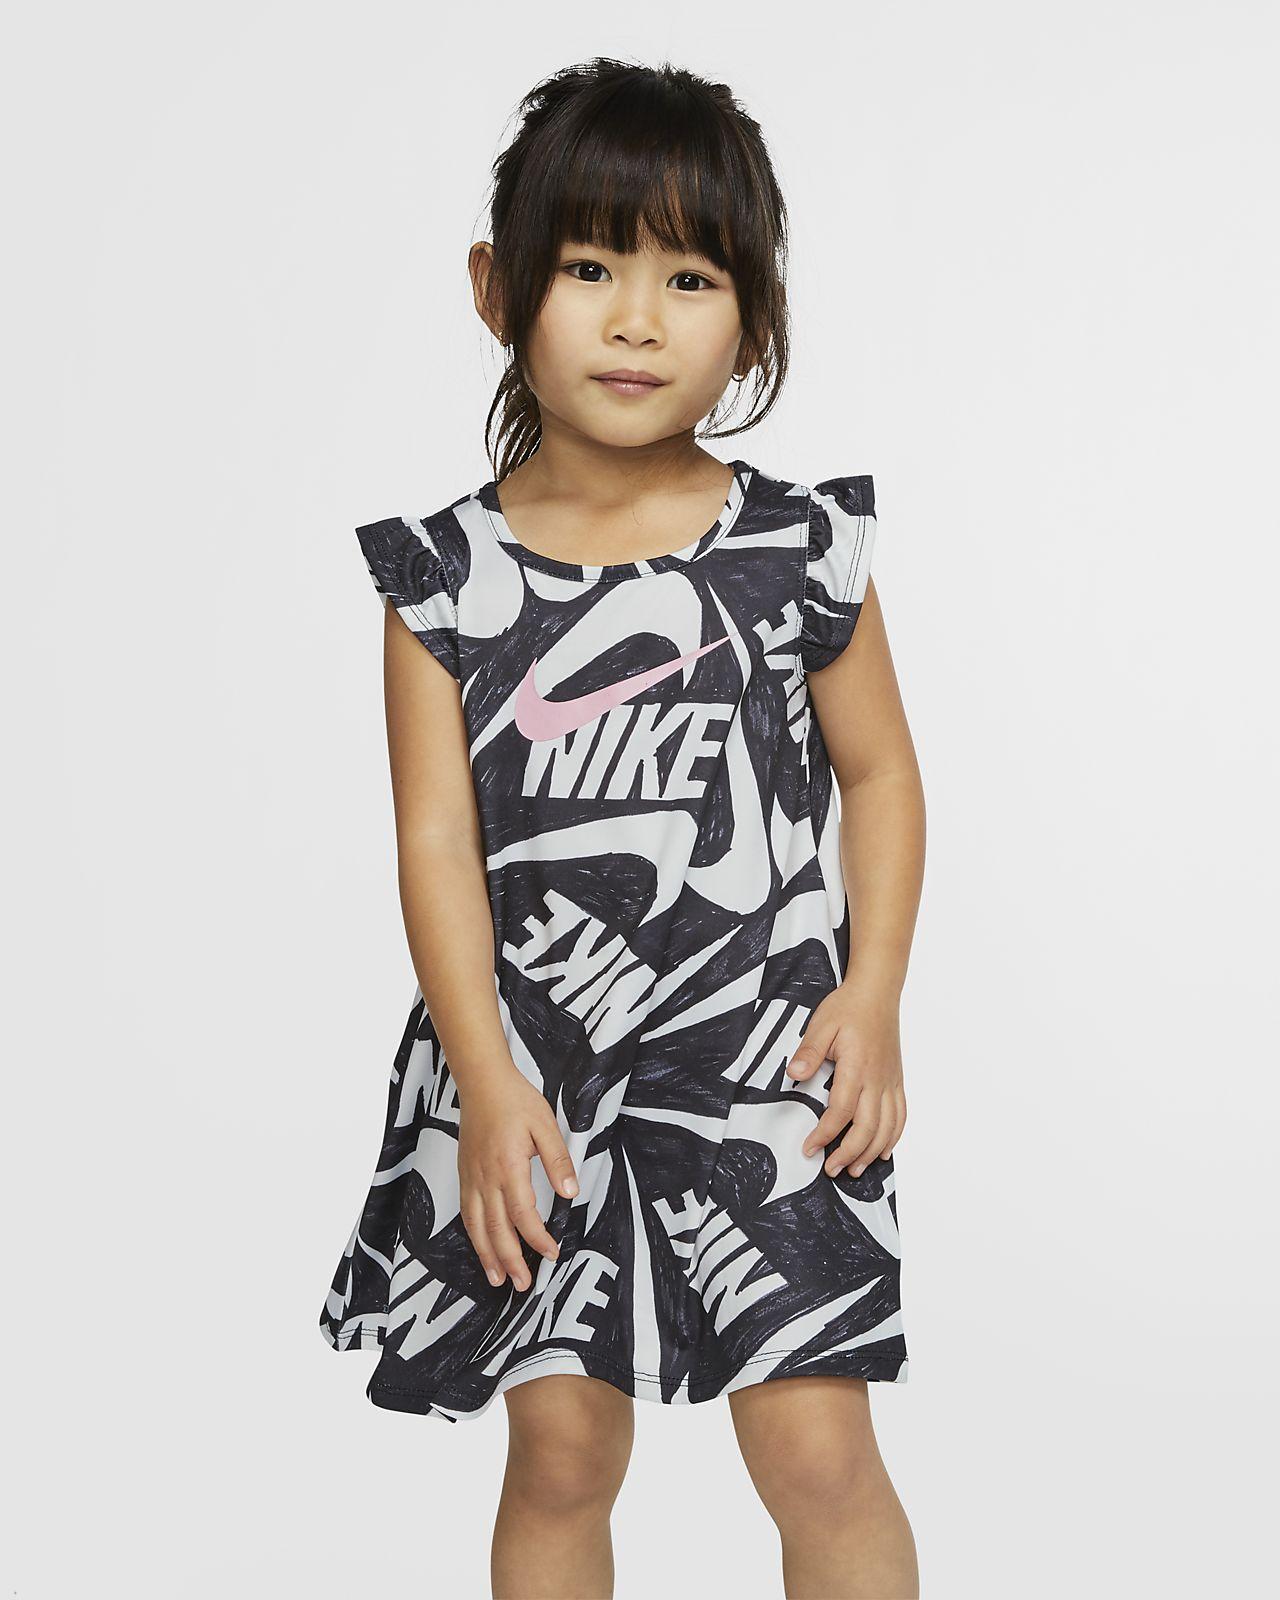 Nike Dri-FIT Toddler Dress